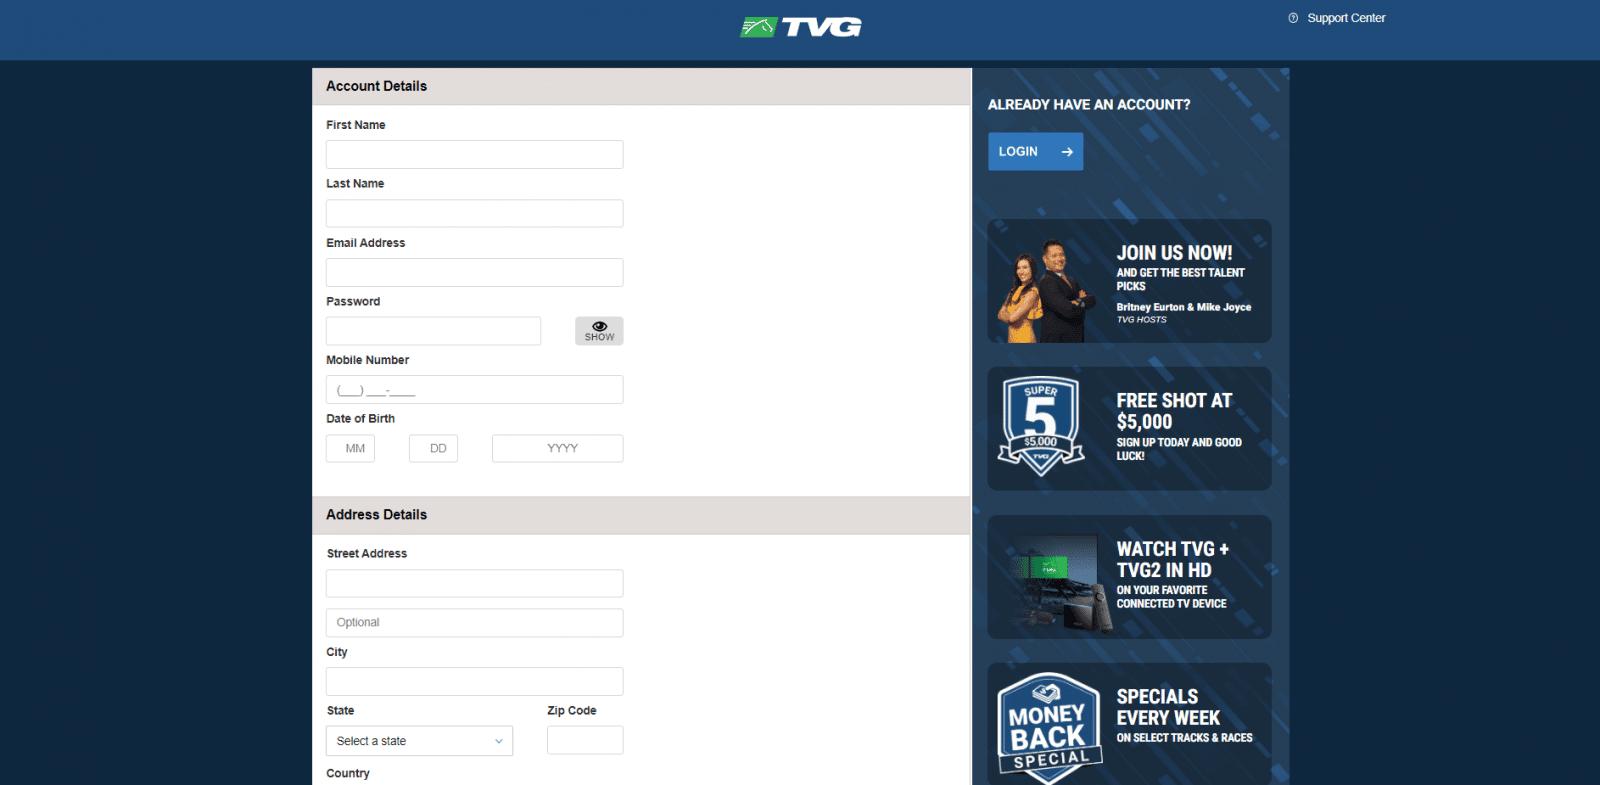 Kentucky derby betting - registration screen